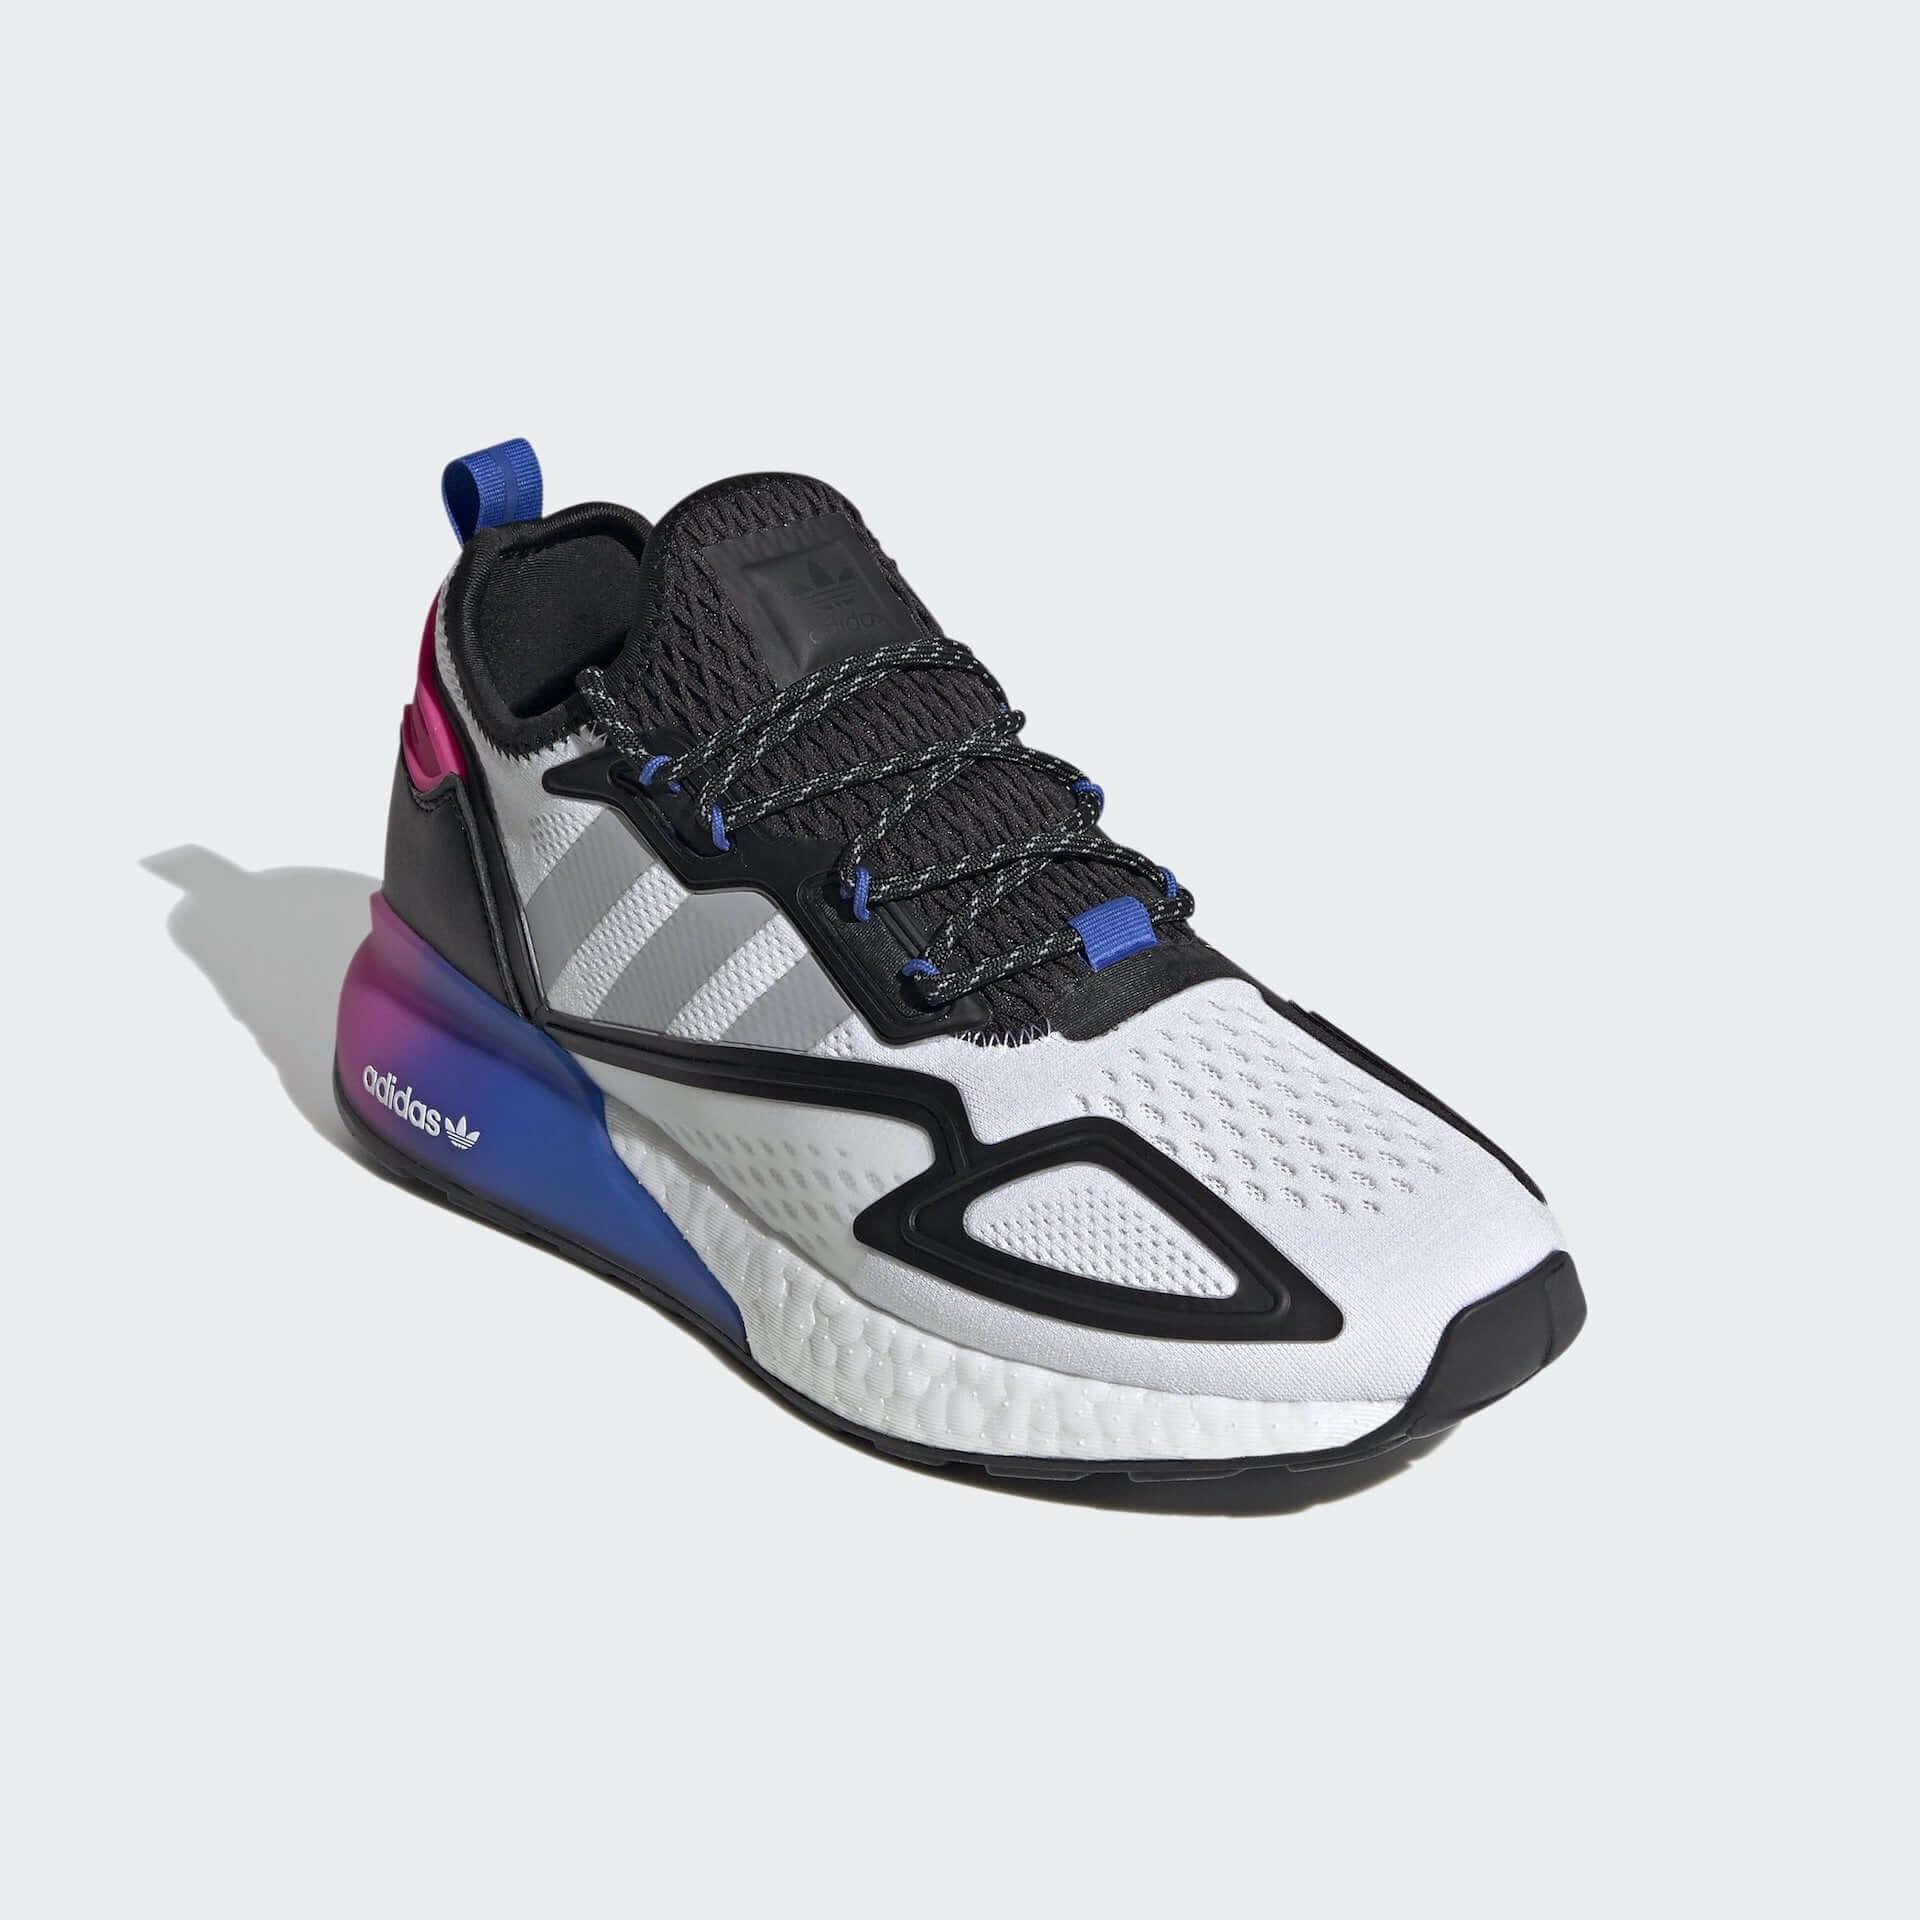 adidas Originalsの「ZX」シリーズから最新モデル『ZX 2K BOOST』が登場!レイザーラモンRG、アントニー出演のIGライブも開催決定 lf200817_adidas-zx_6-1920x1920